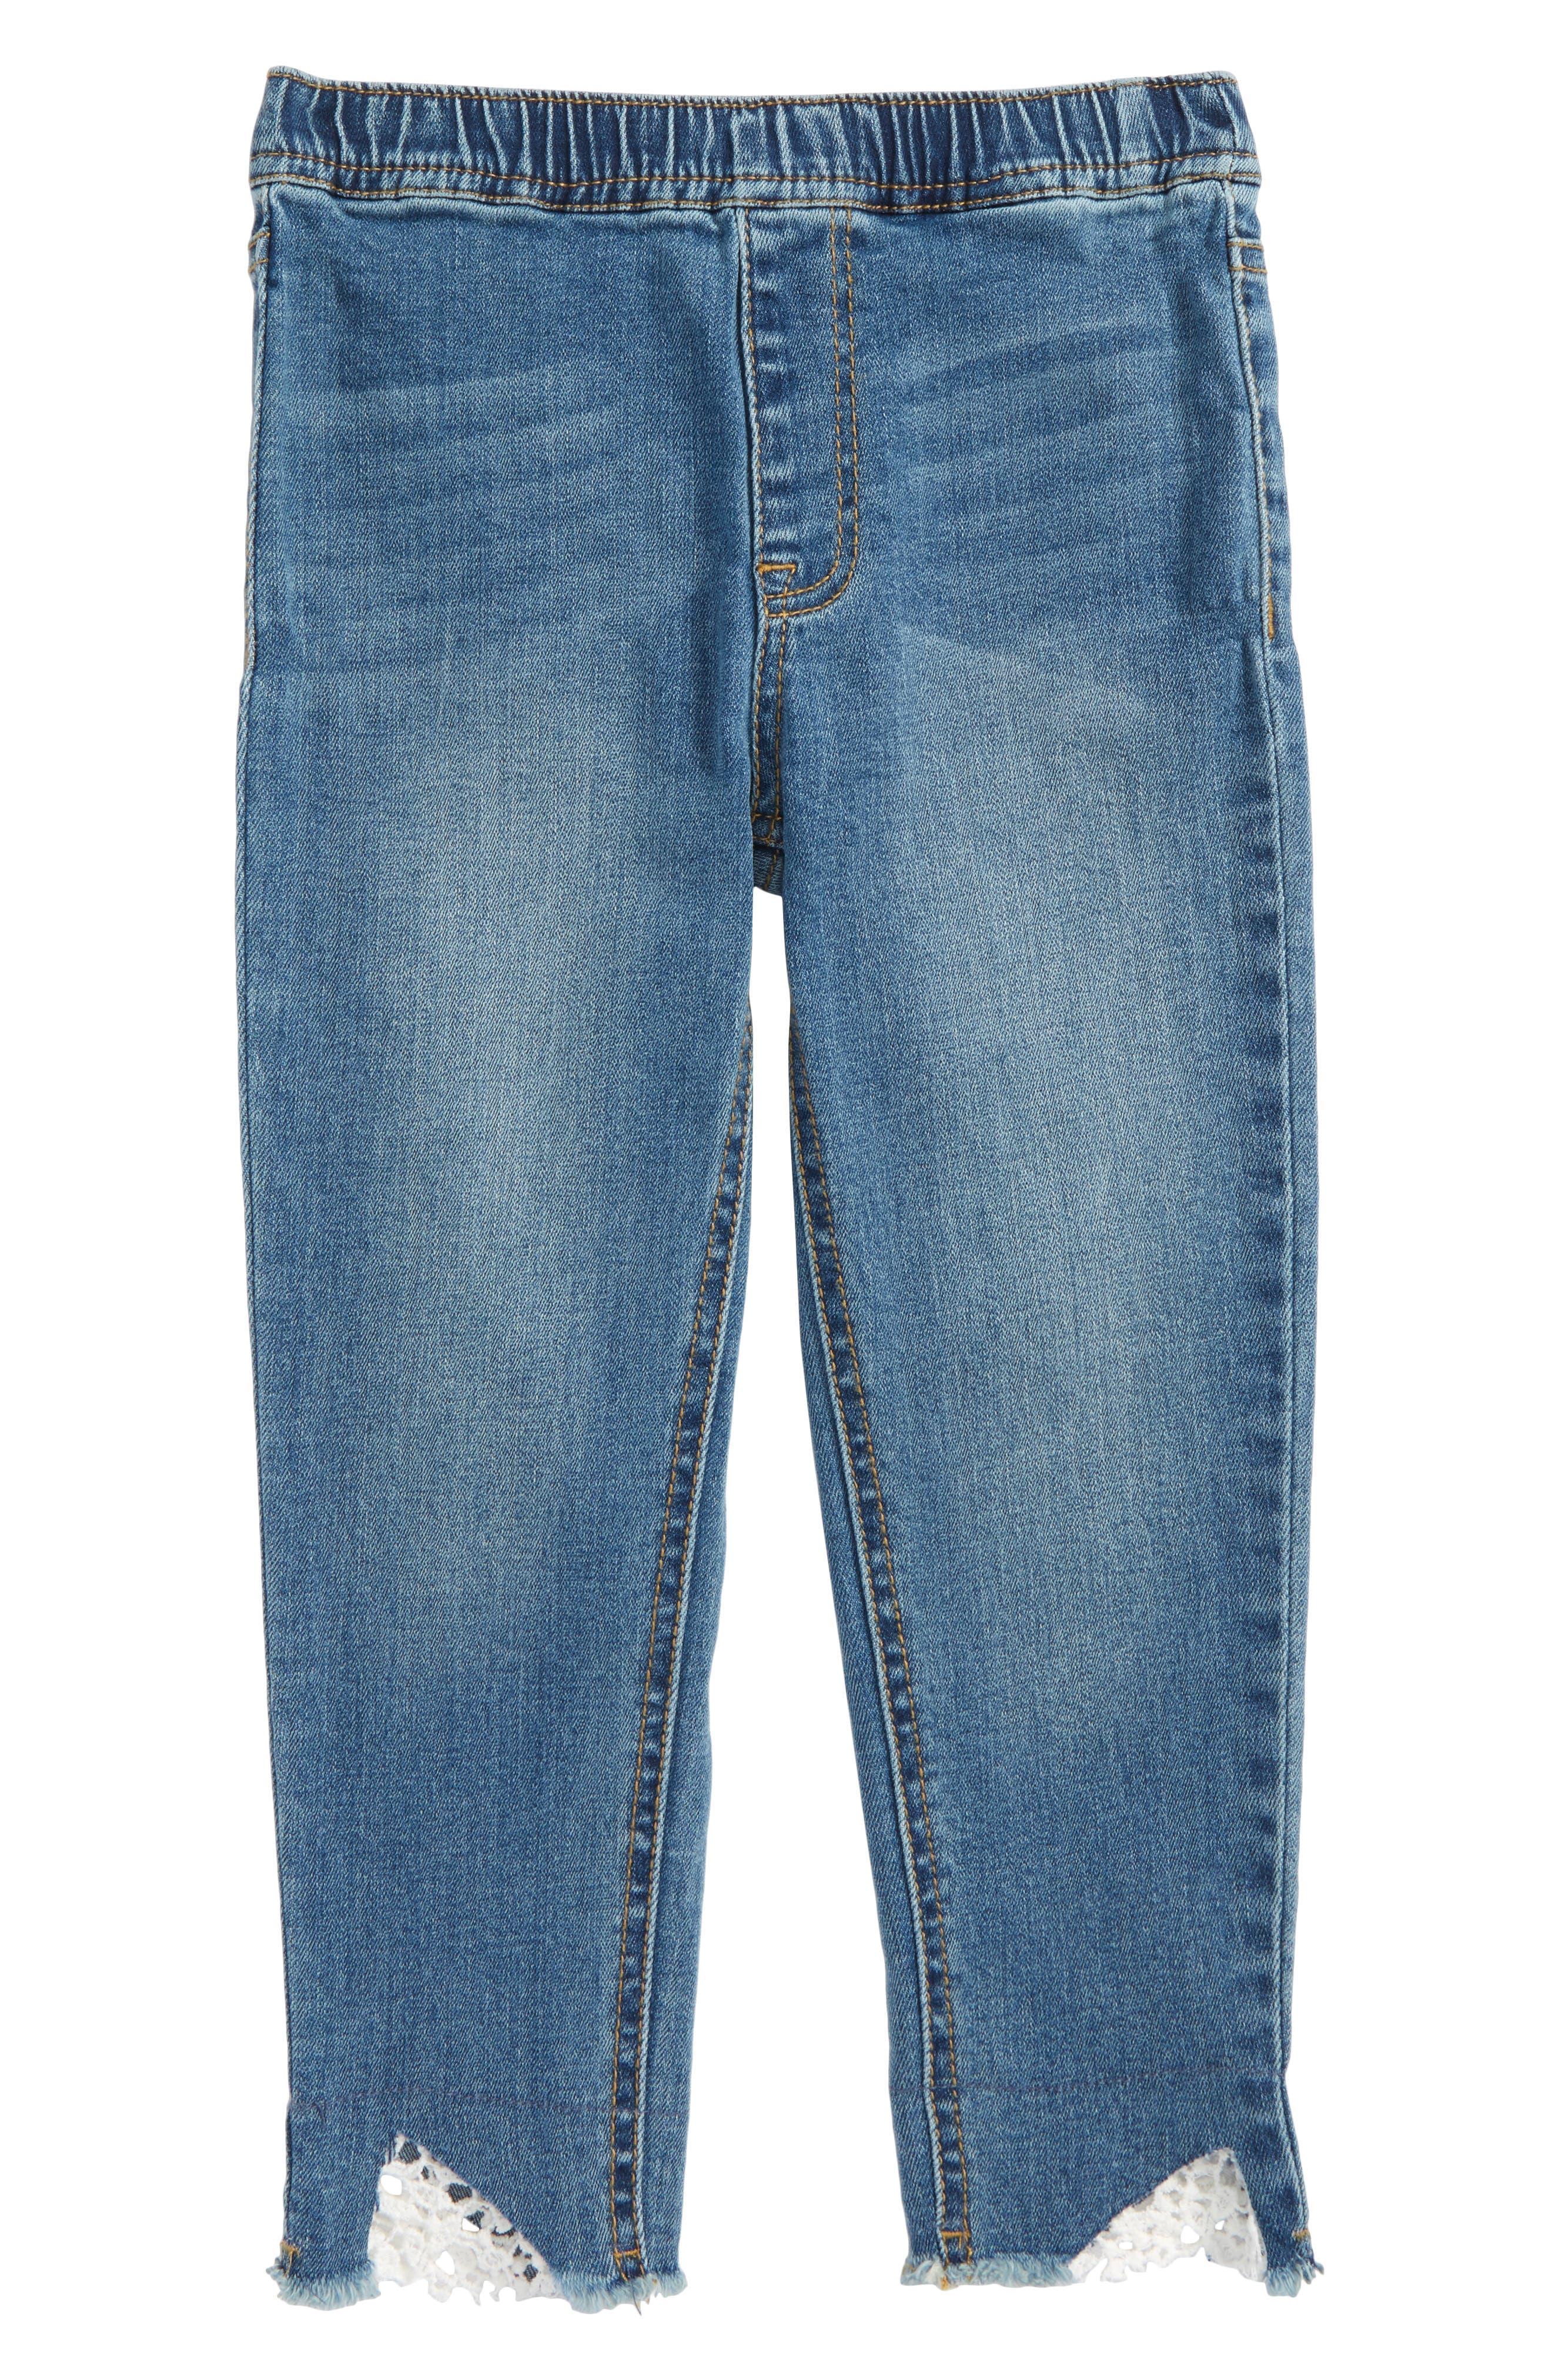 Crop Jeans,                             Main thumbnail 1, color,                             Lagoon Wash